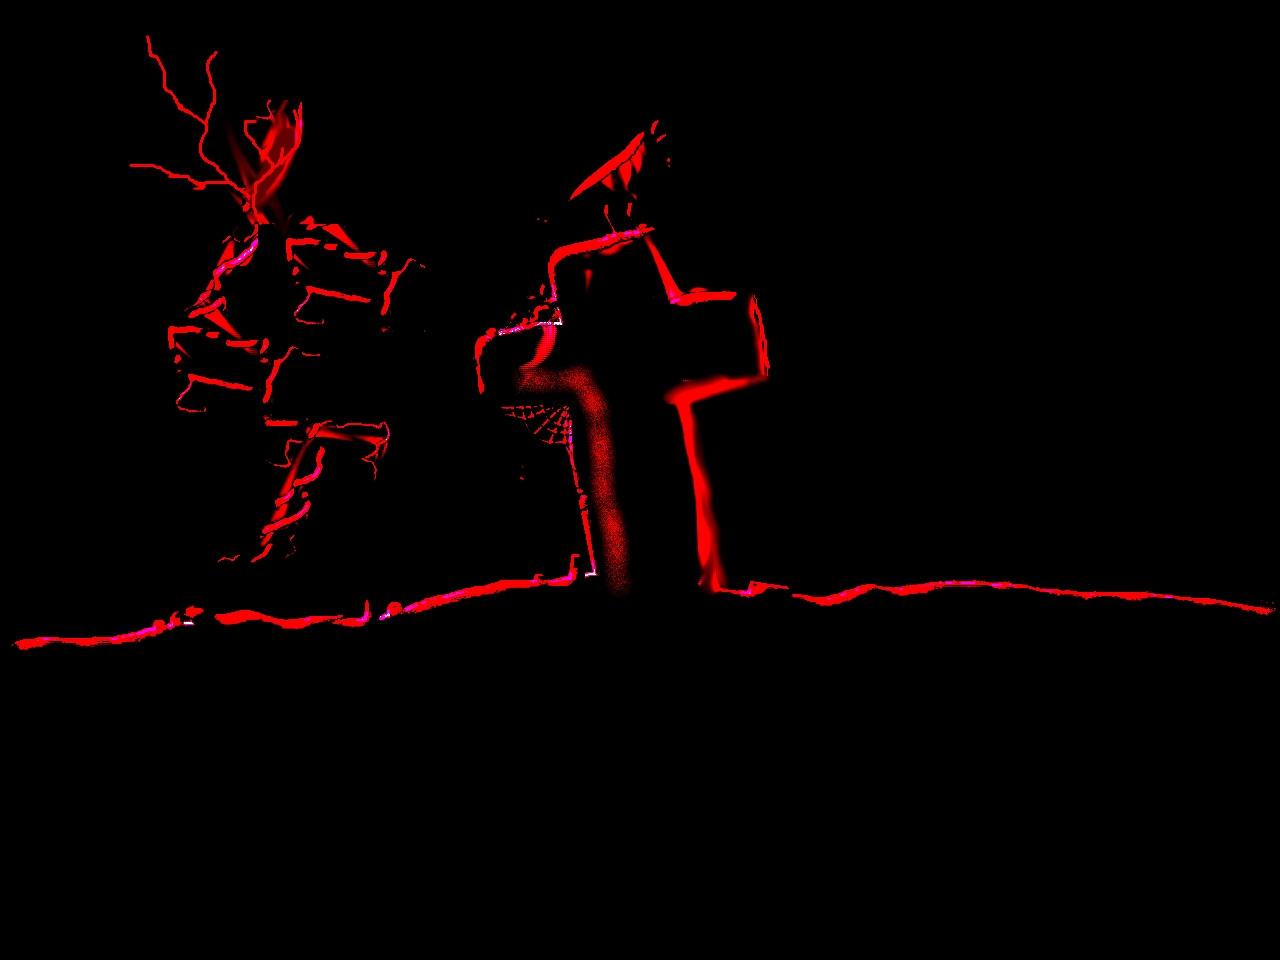 Red RIP Dream